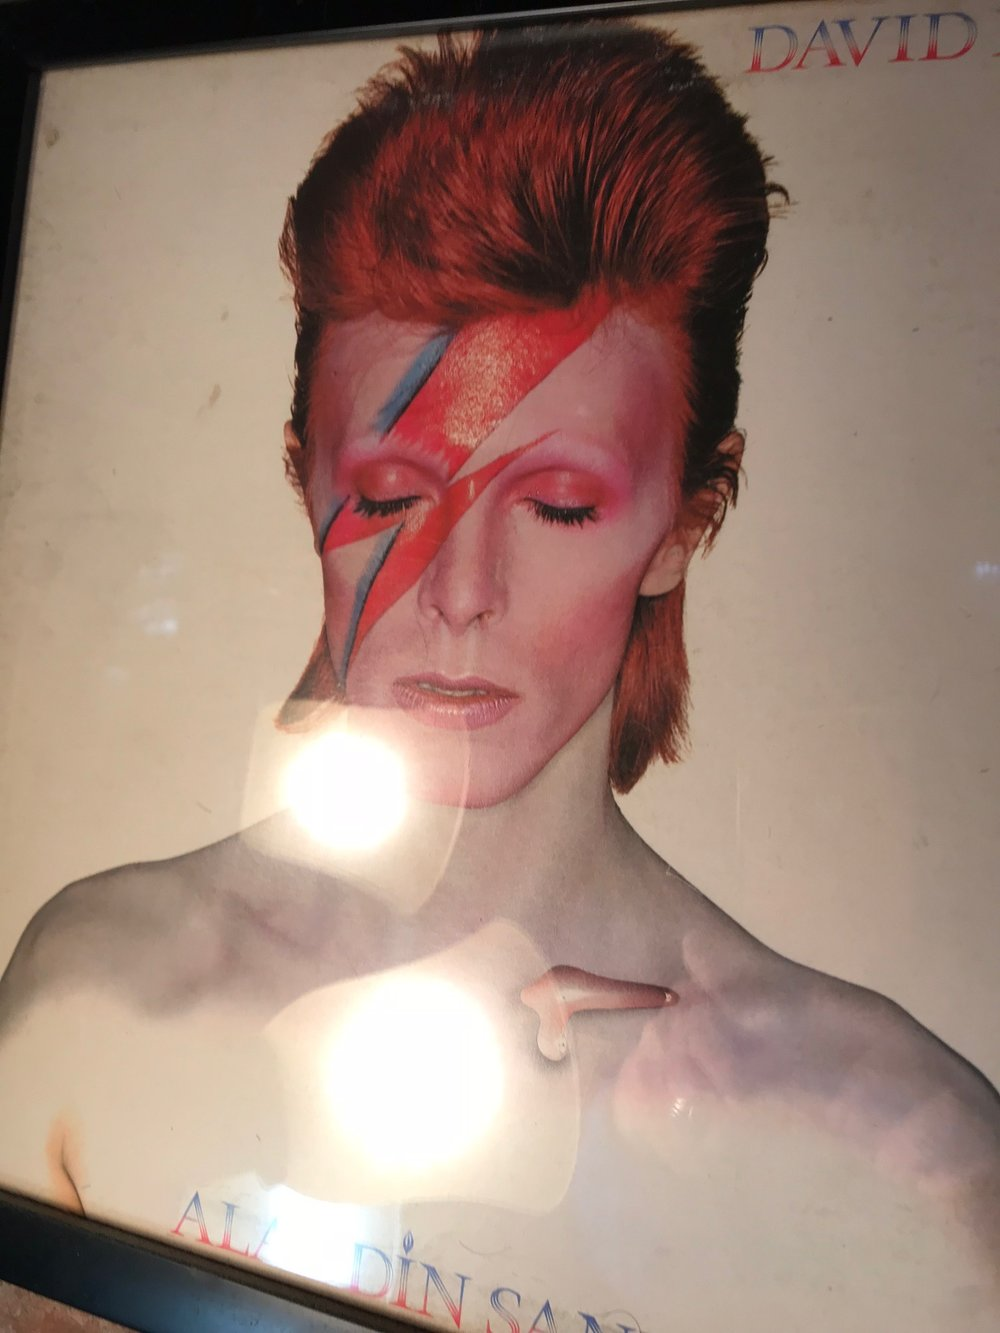 David Bowie IMG_3417.jpg*.jpg